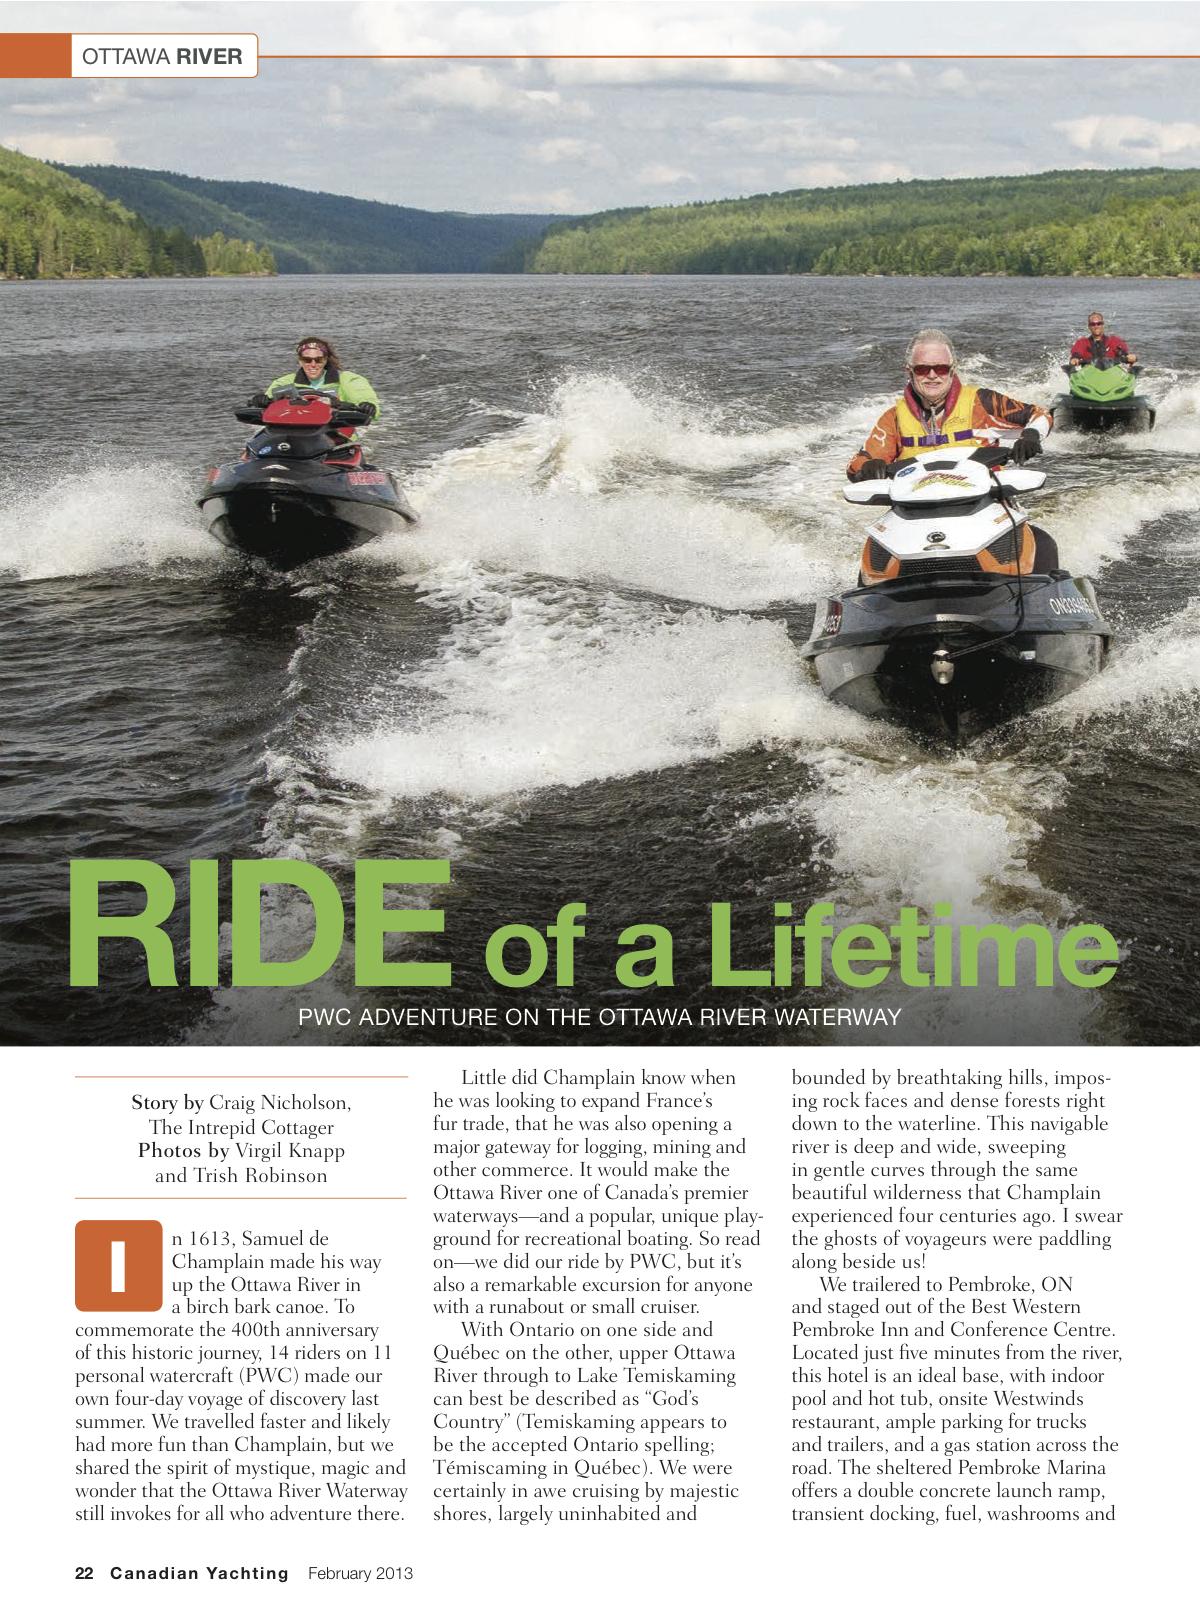 PDF of article on Ottawa River Sea Doo Tour